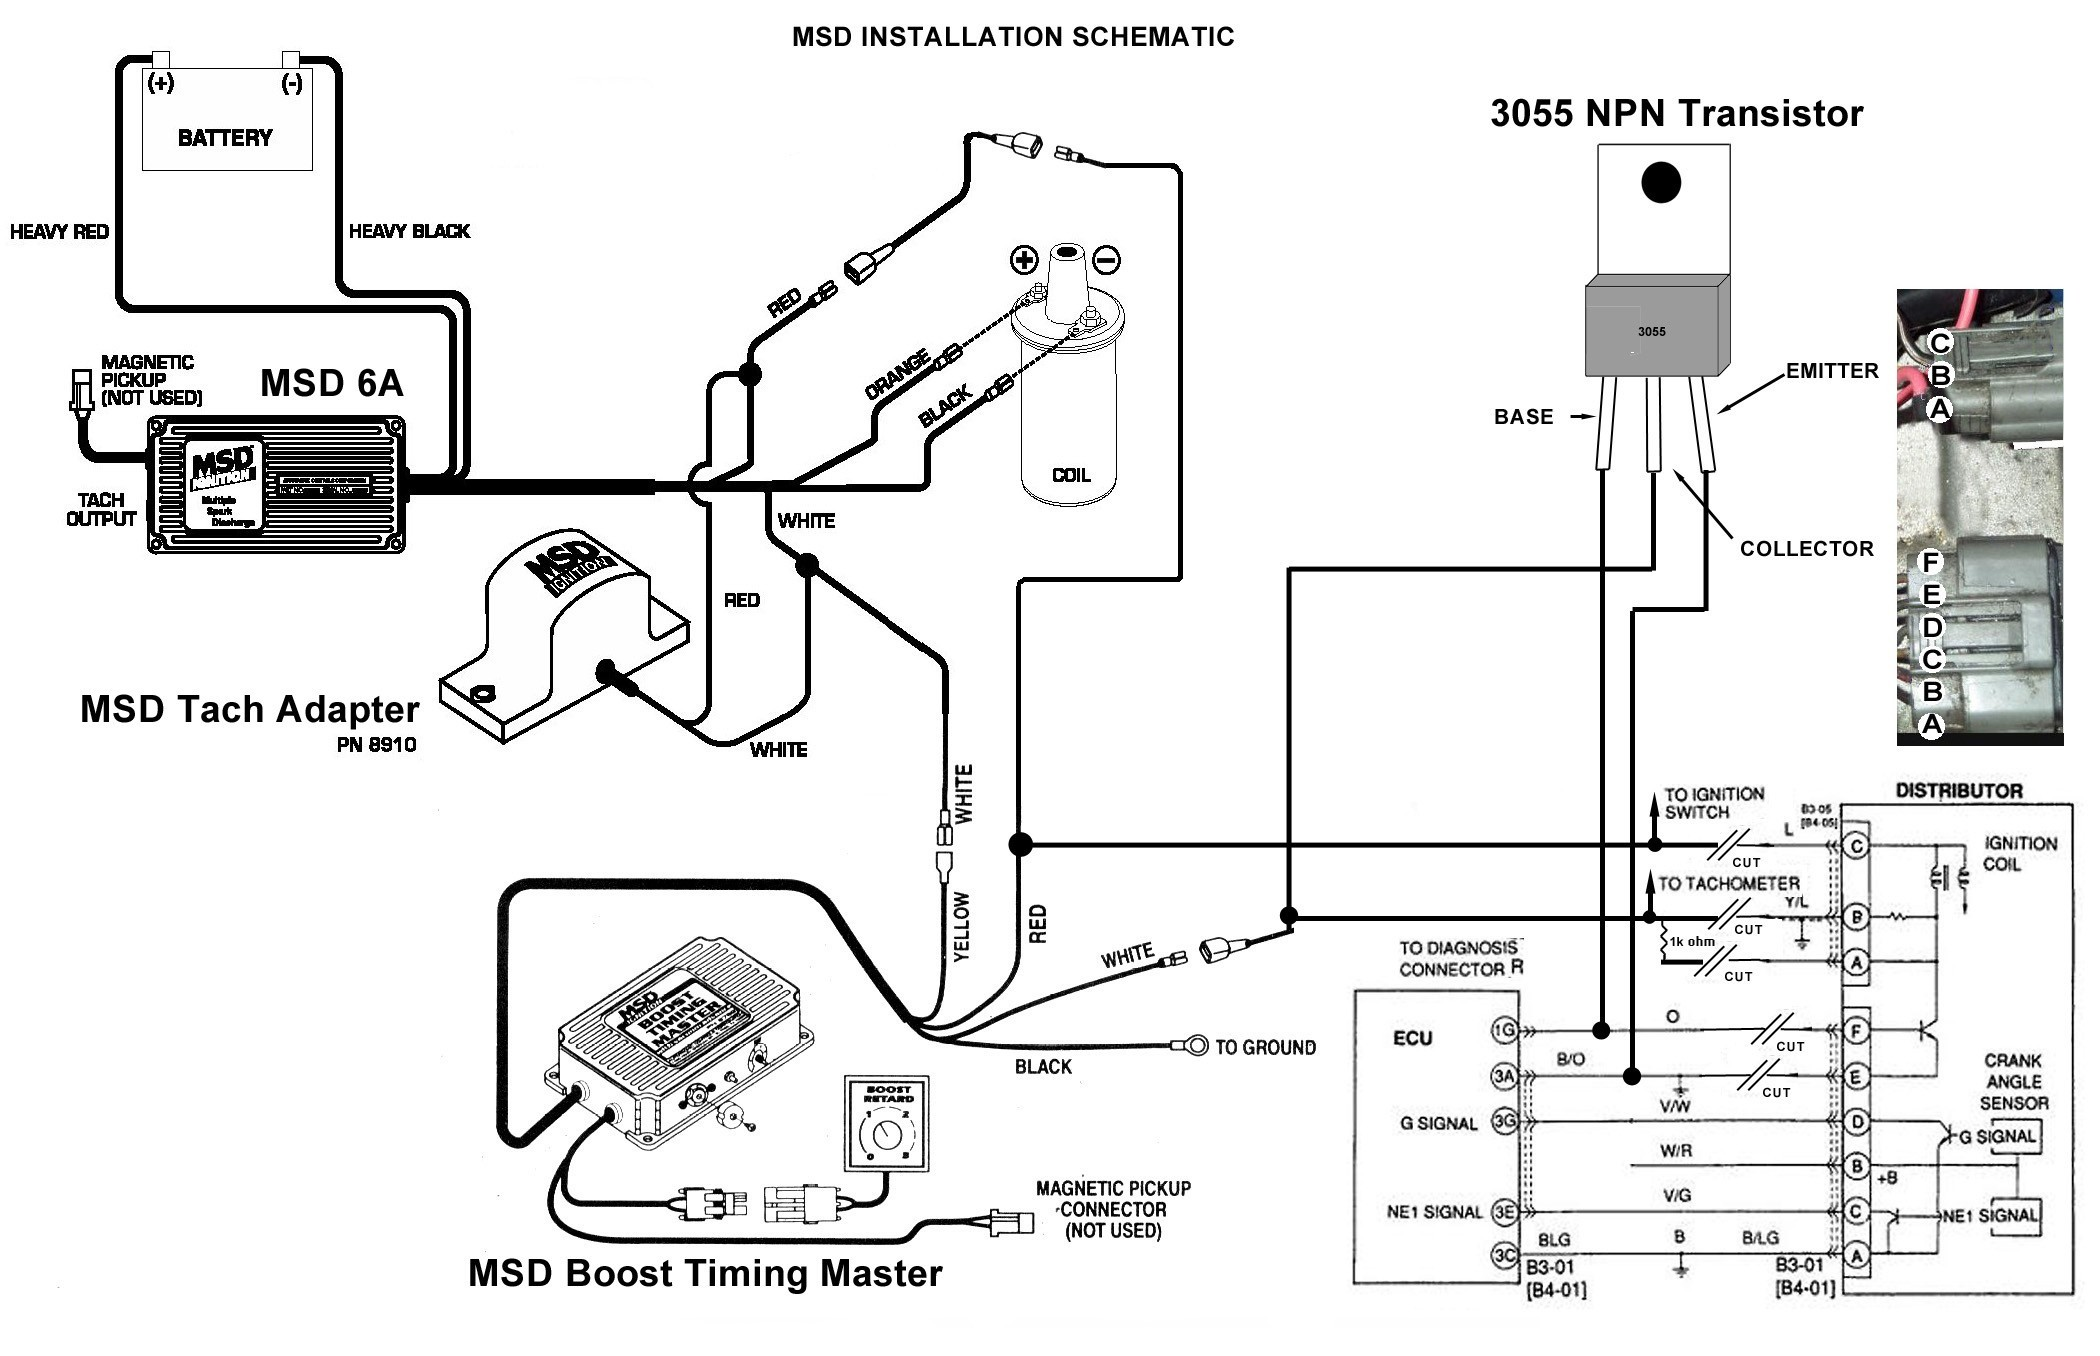 2001 Mazda Tribute V6 Engine Diagram 1997 Mazda Mx6 Wiring Schematic Reveolution Wiring Diagram • Of 2001 Mazda Tribute V6 Engine Diagram